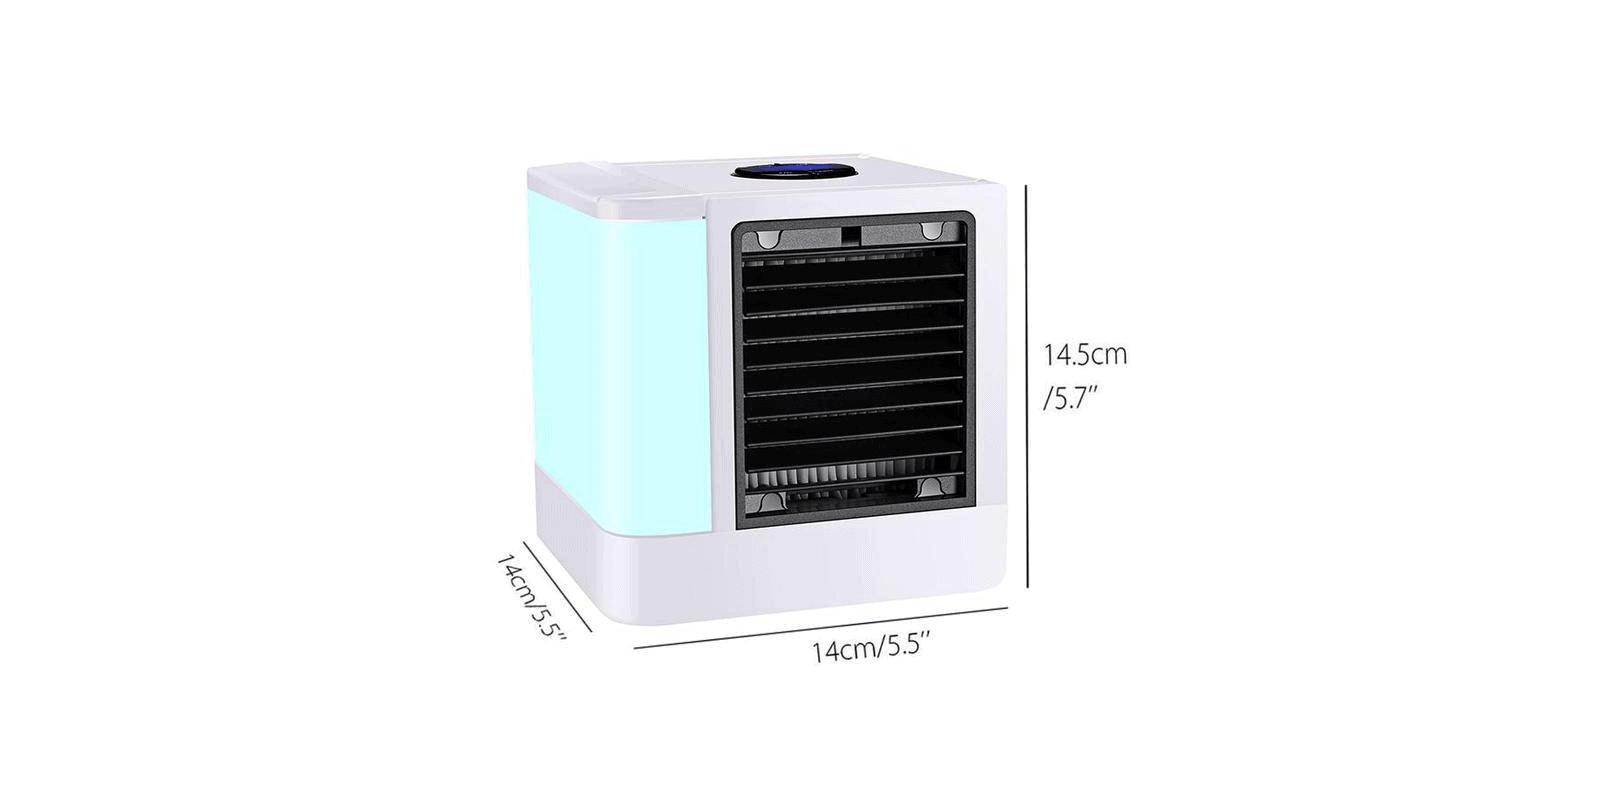 T10 Air Cooler